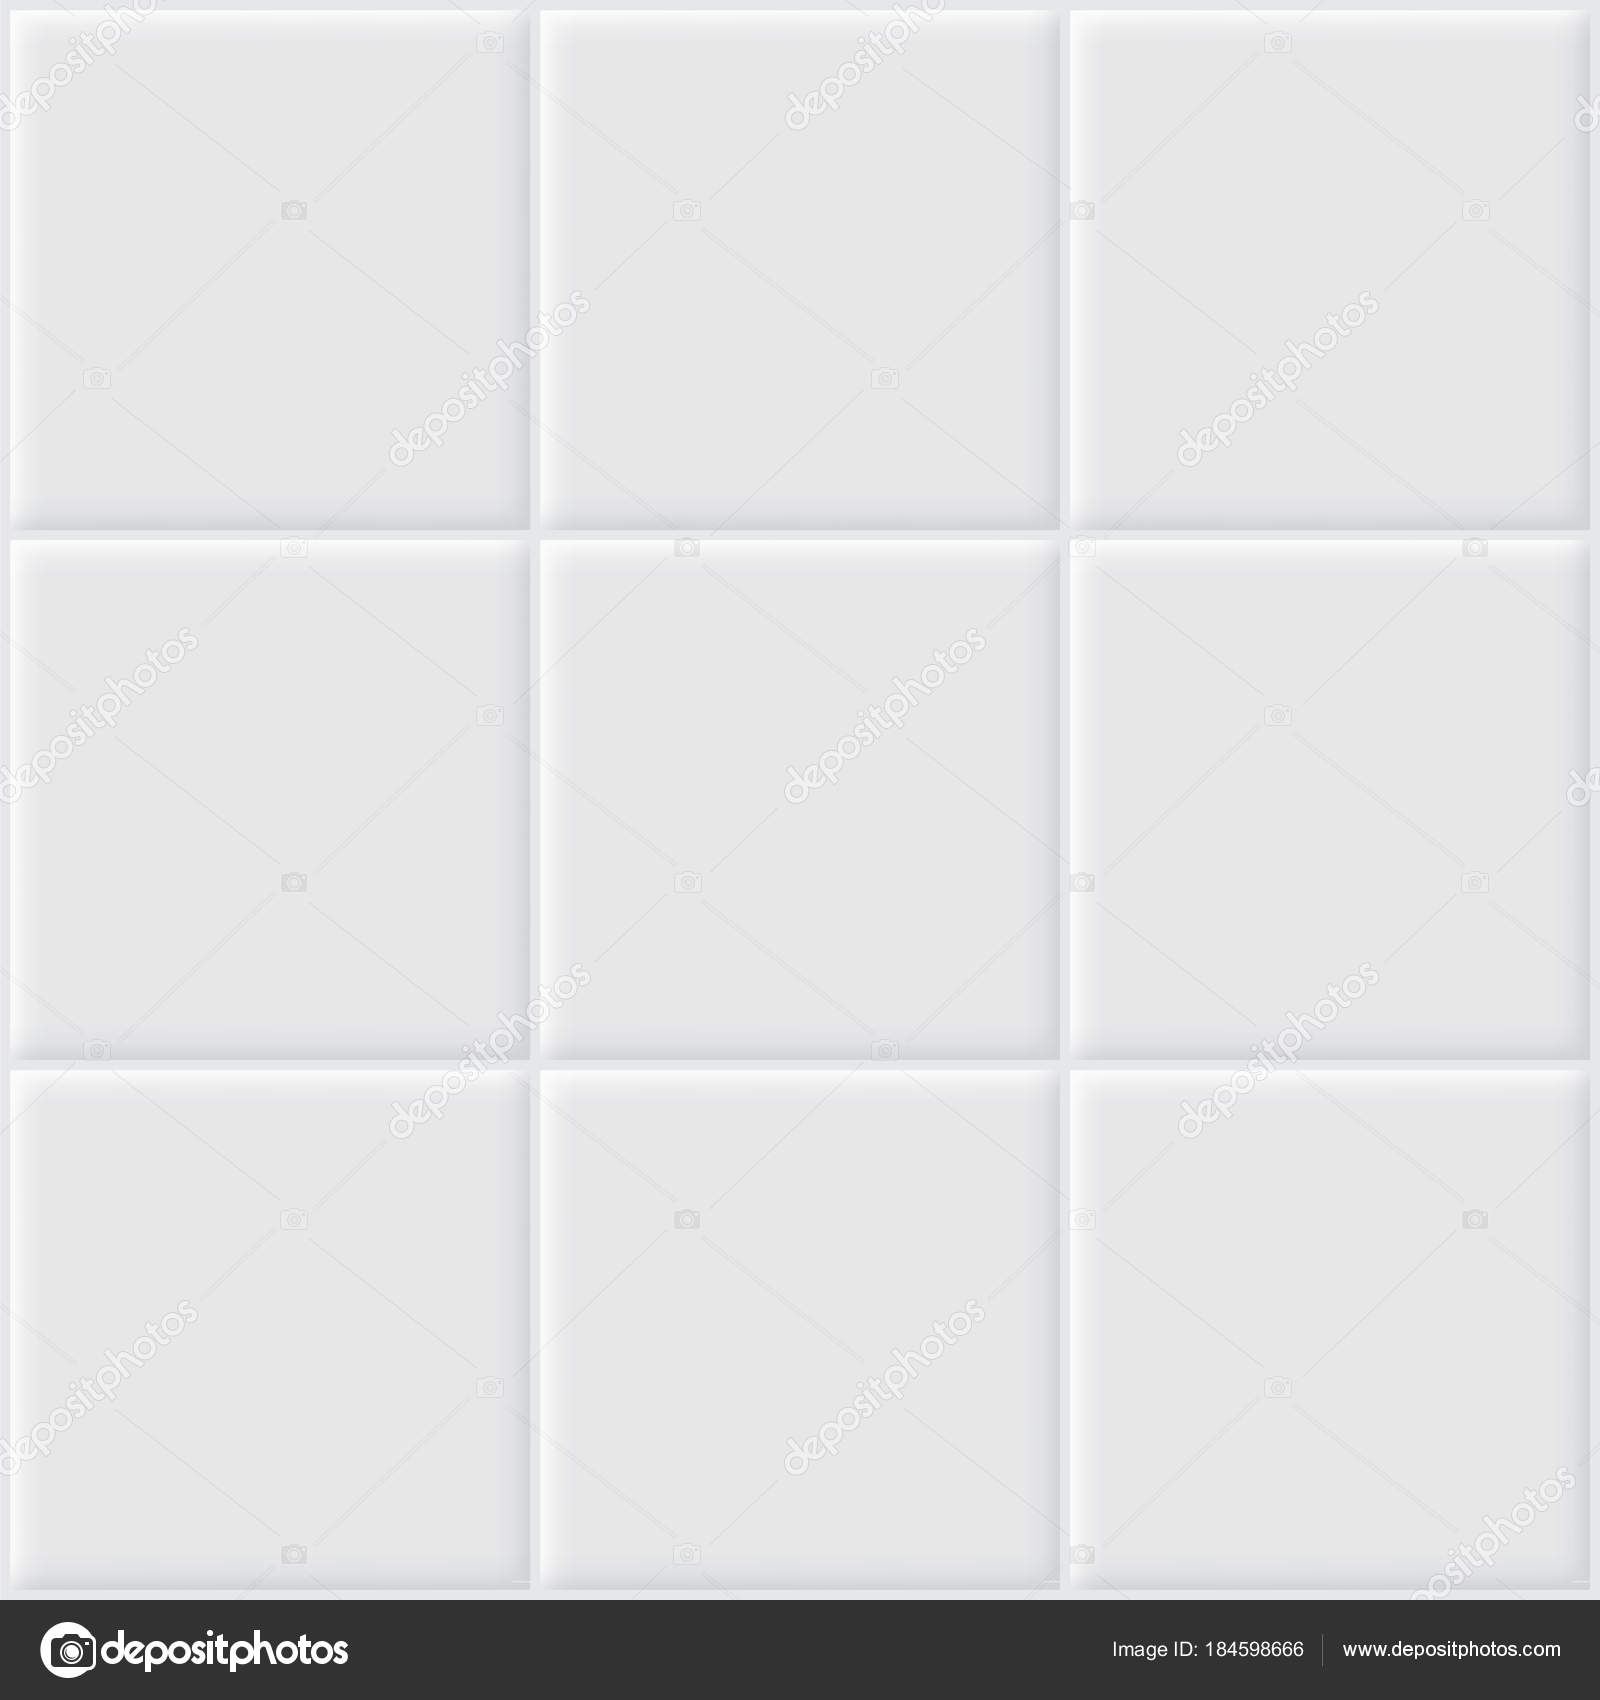 Turbo Weiße Fliesen Vektor — Stockvektor © roncivil #184598666 BM85